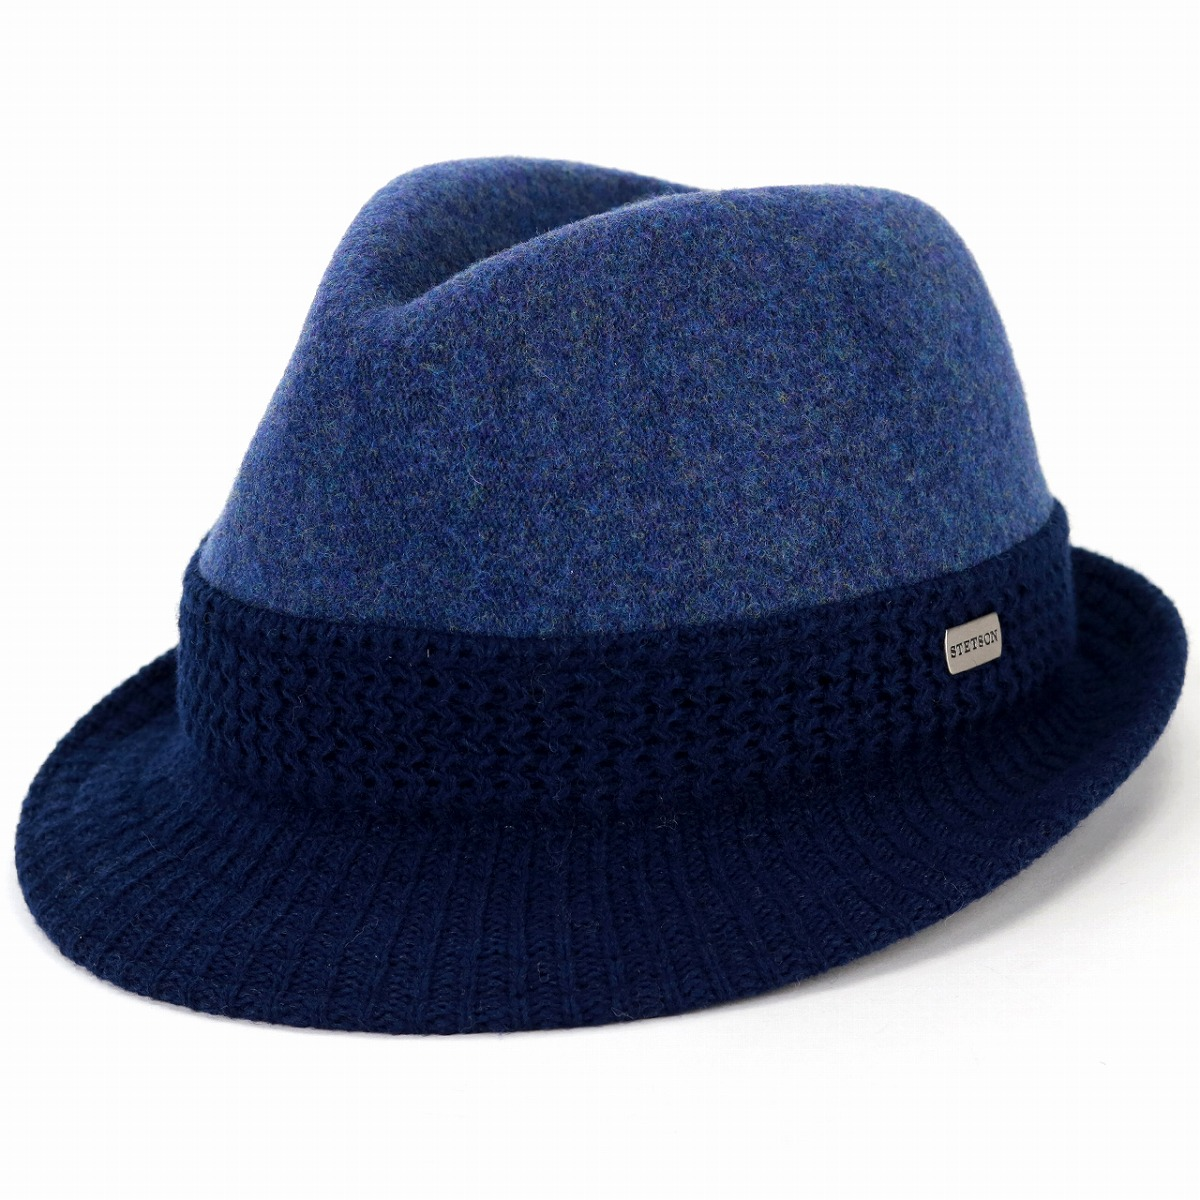 9615e663211c9 ELEHELM HAT STORE  Soft felt hat hat lady s hair blend big size ...